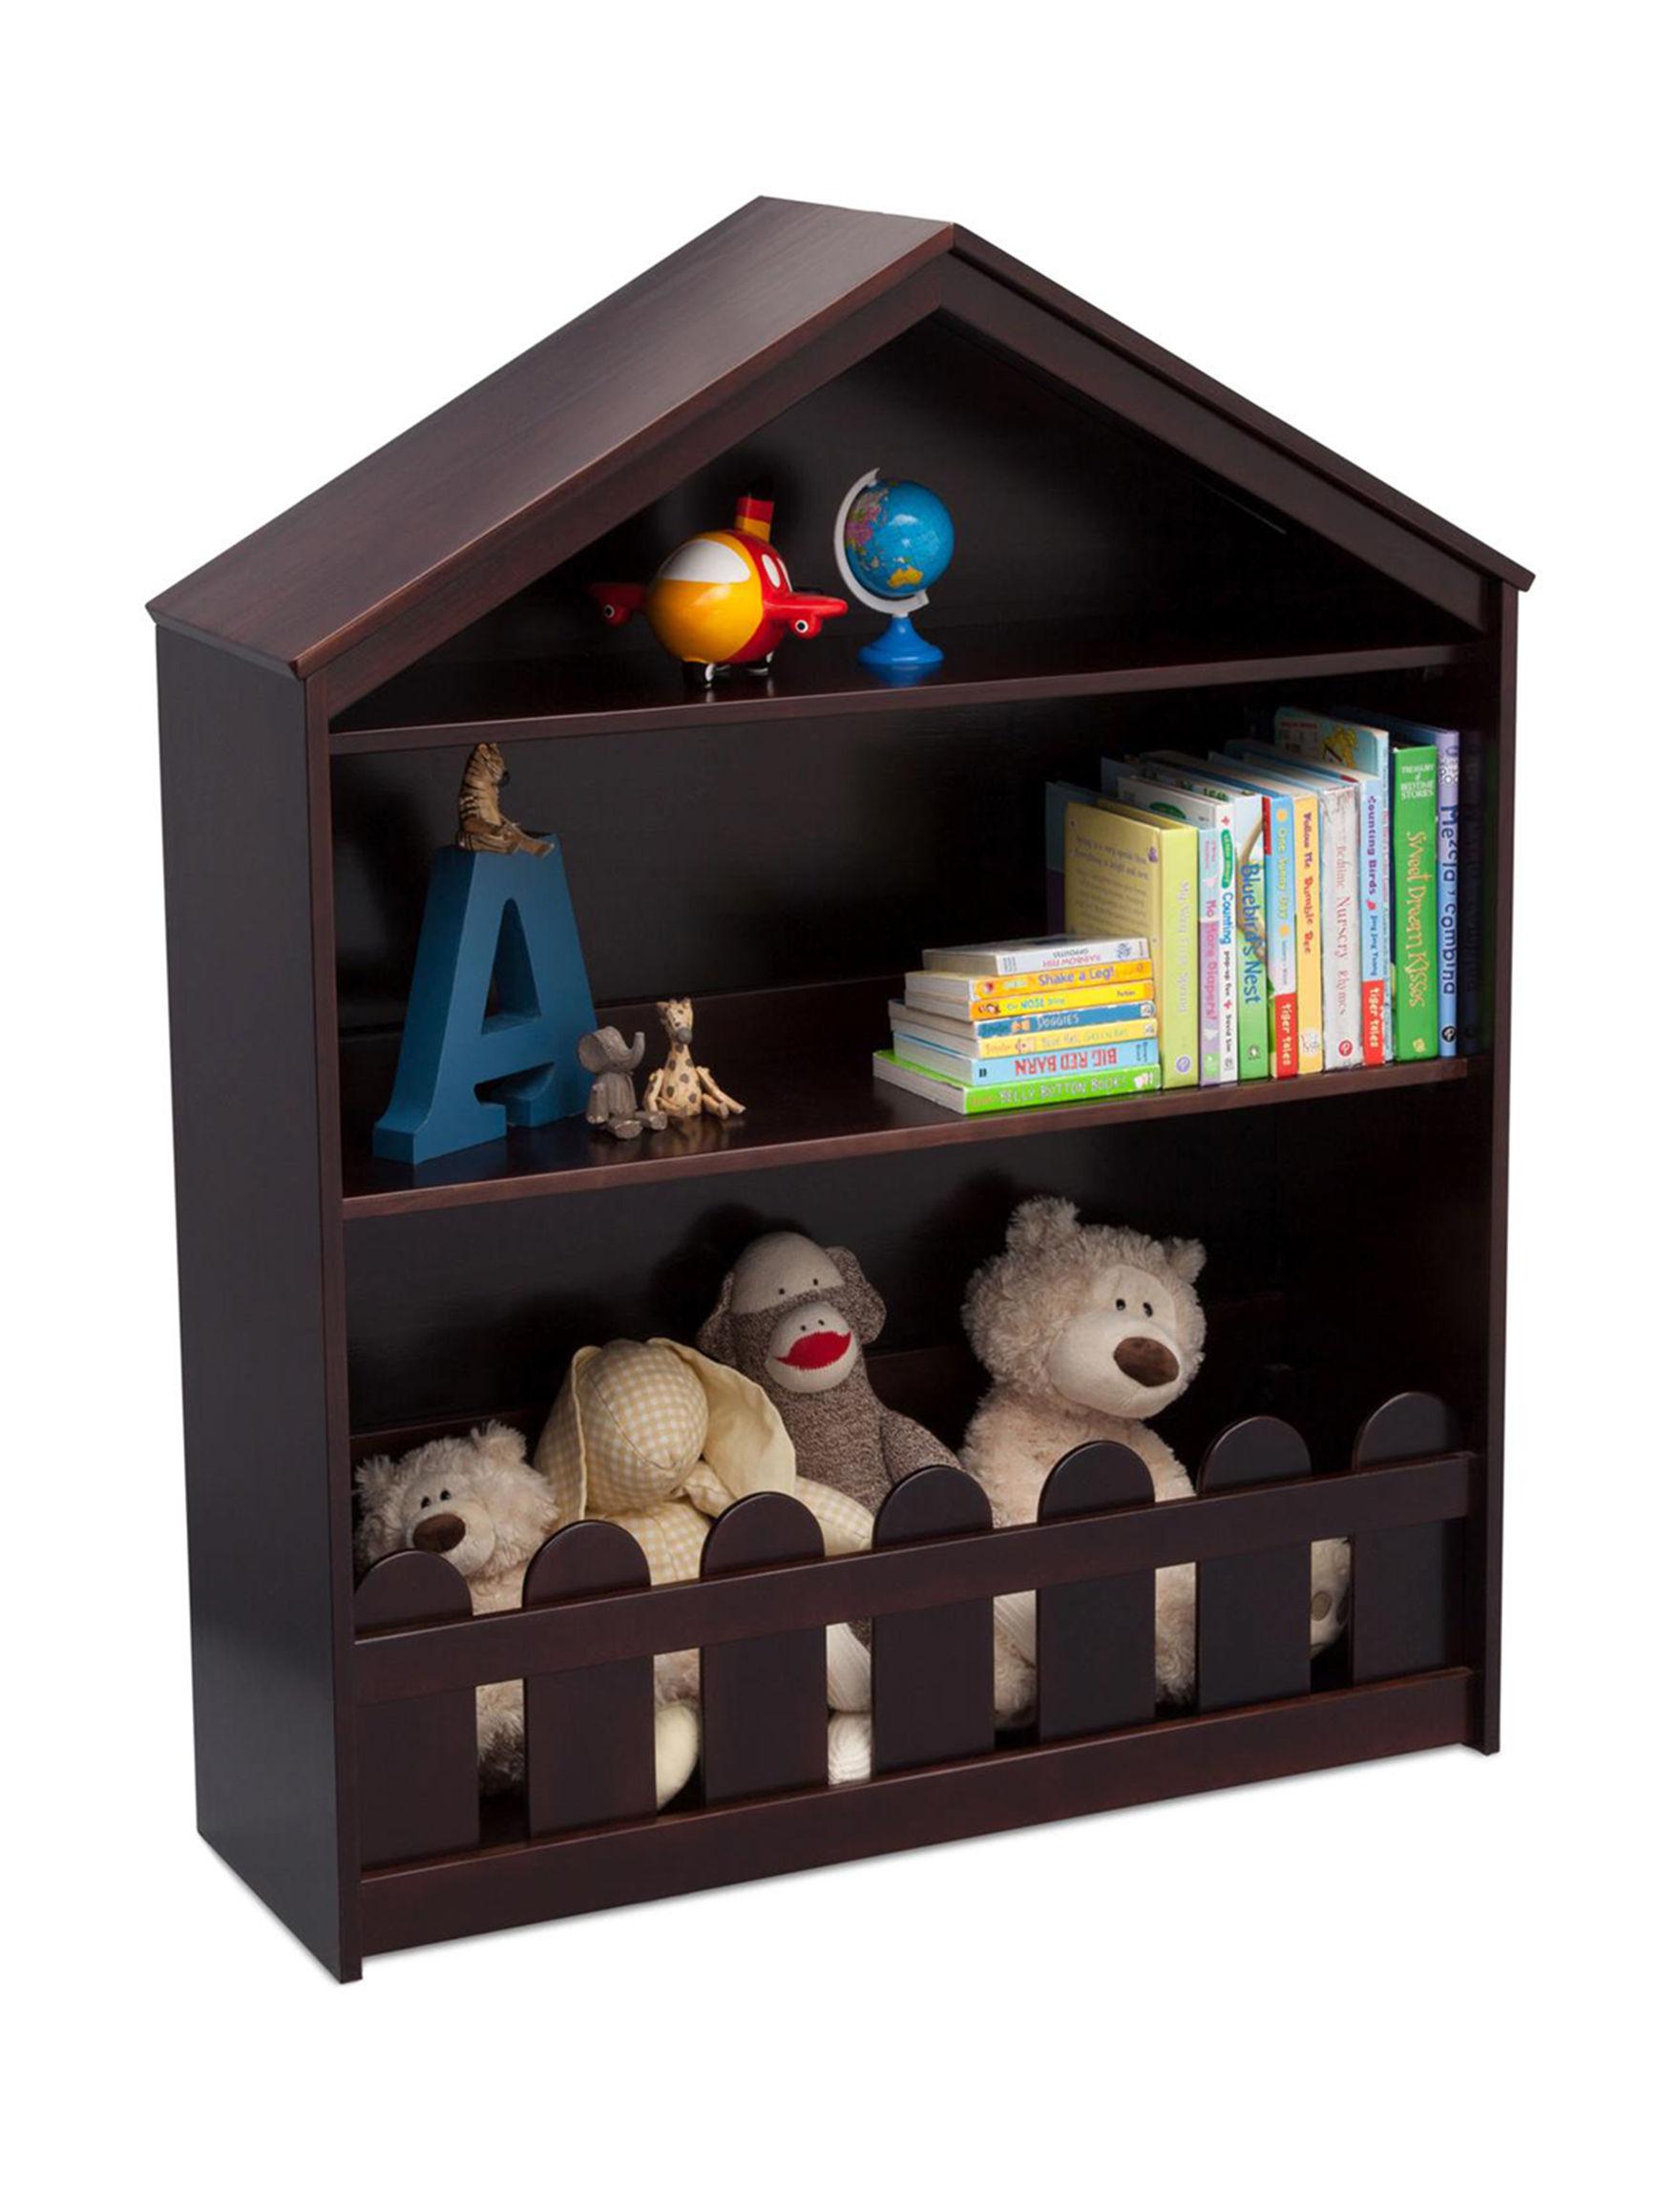 Serta Dark Chocolate Bookcases & Shelves Living Room Furniture